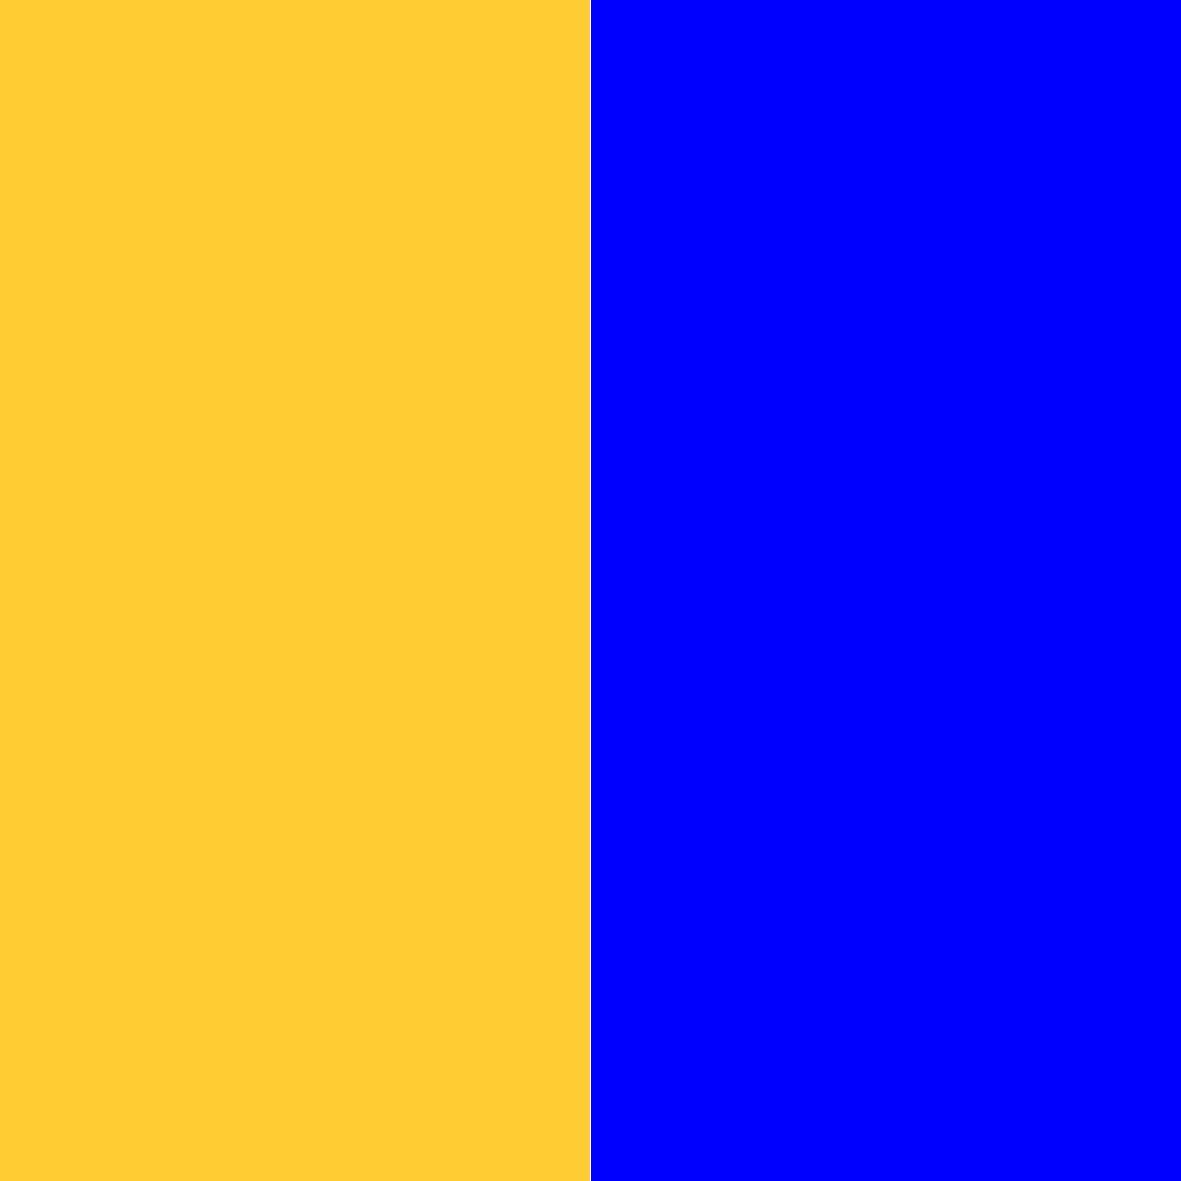 желтый/синий_FFCC33/0000FF